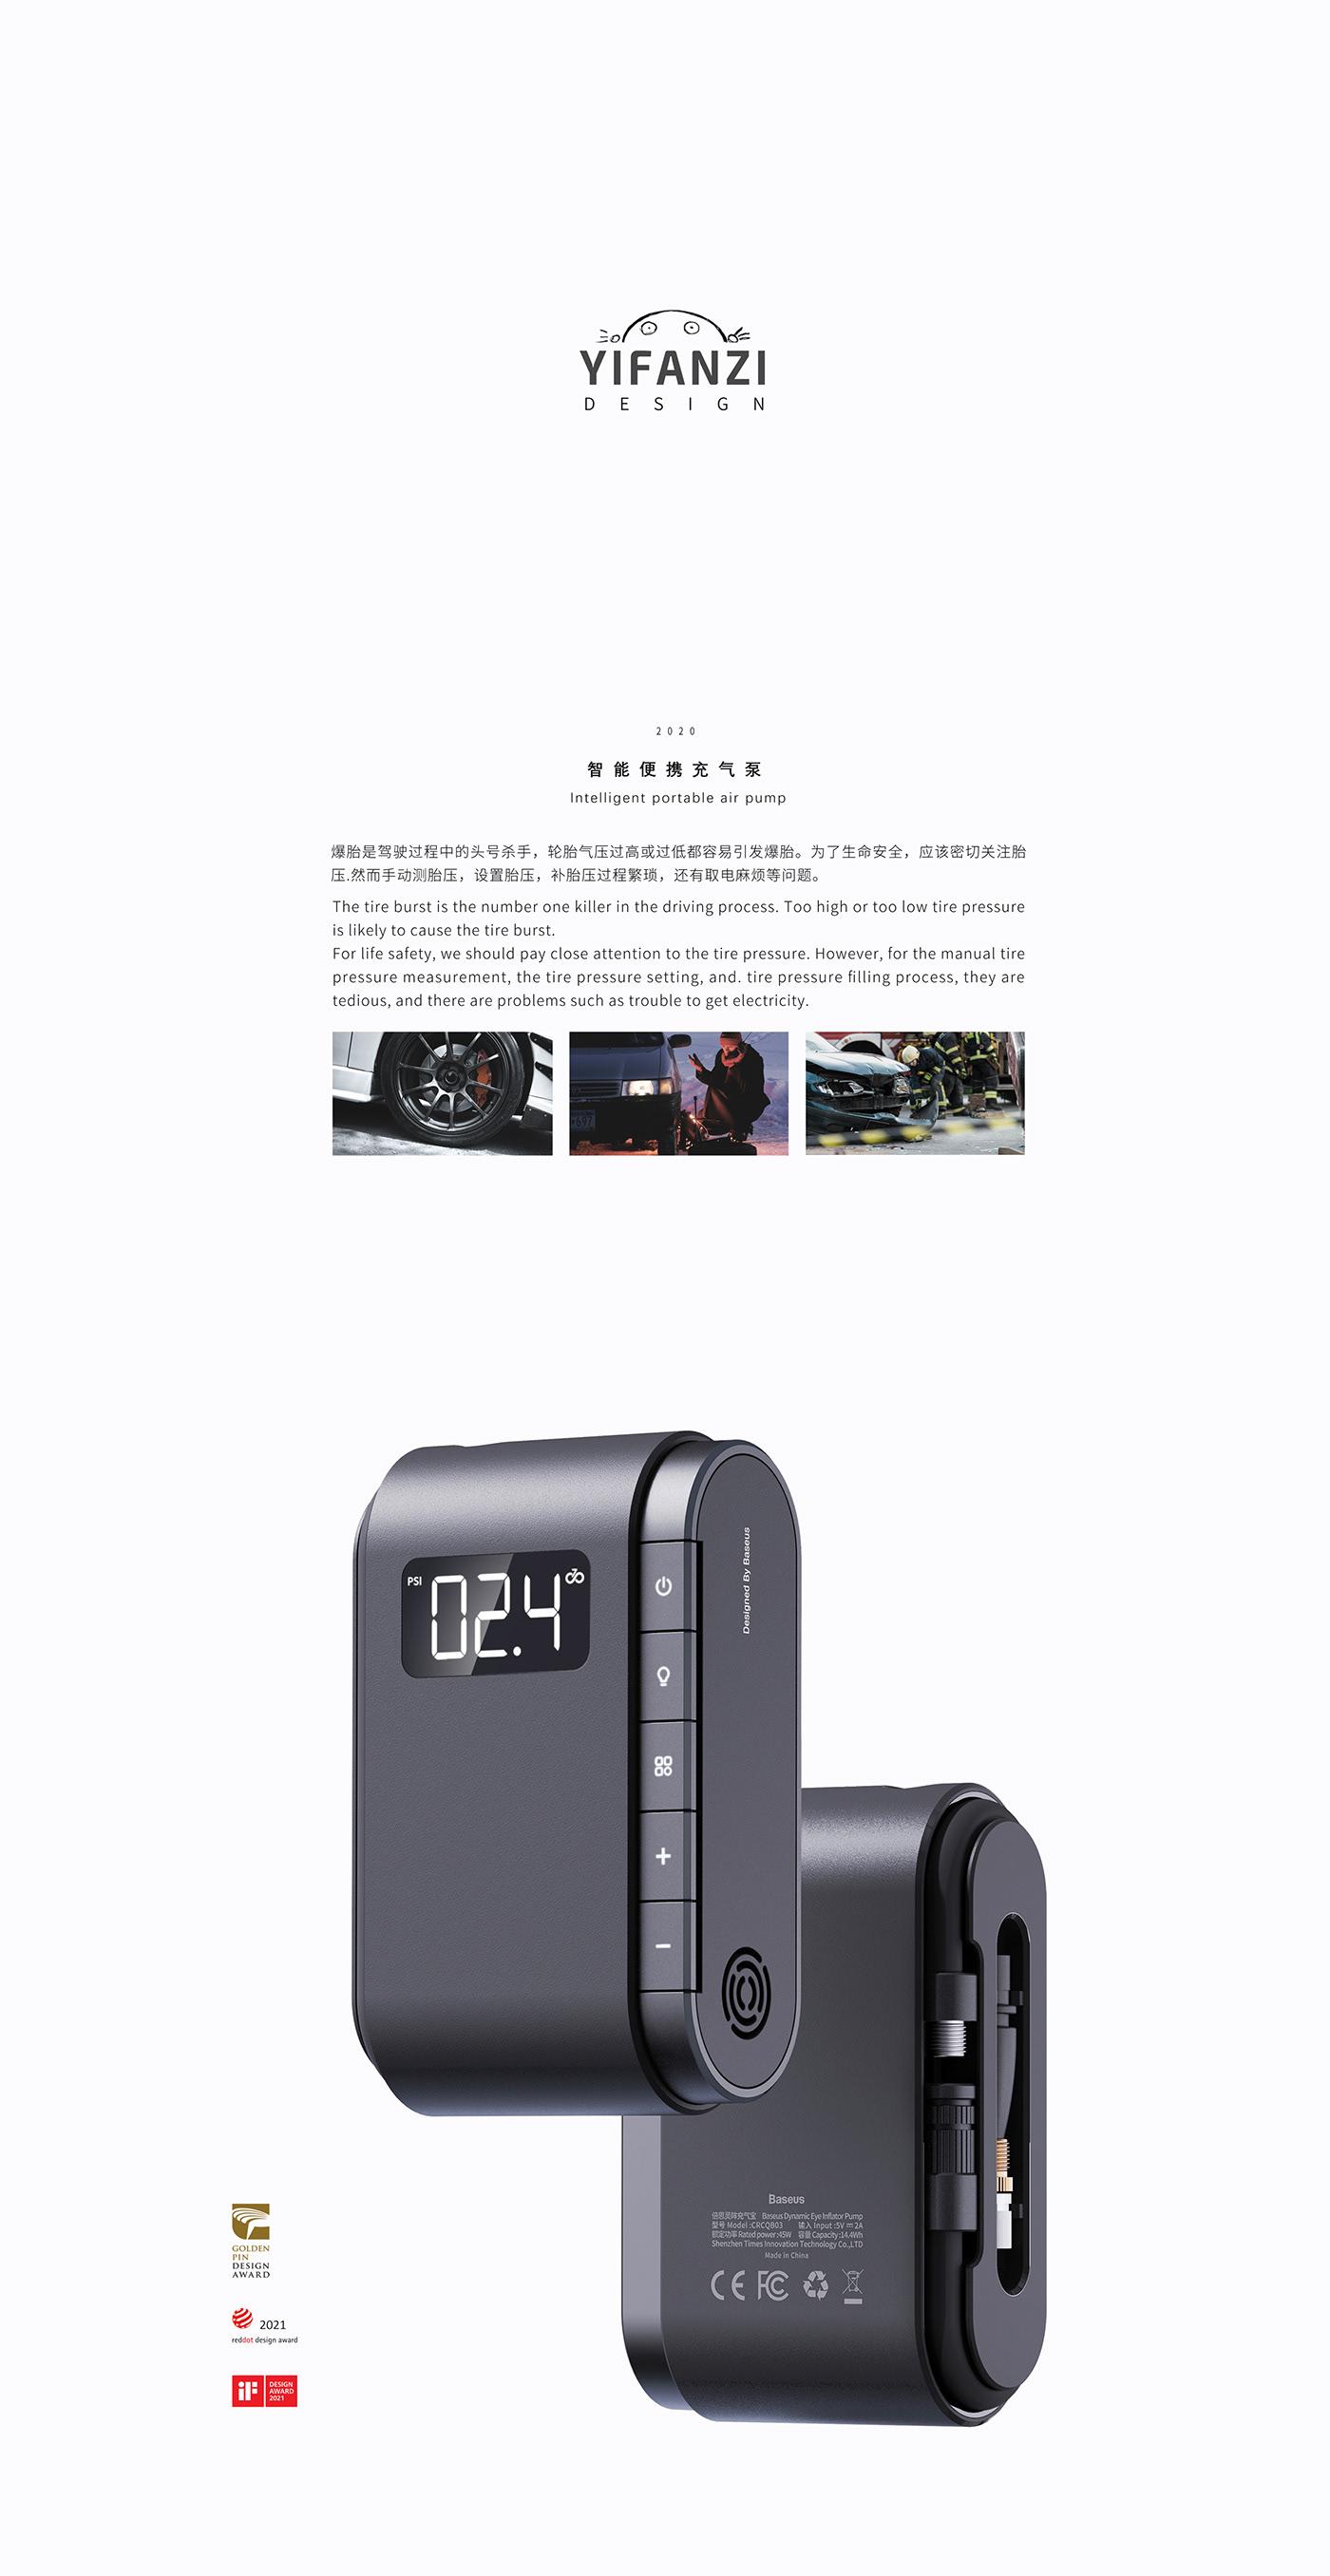 air pump Automotive products industrial design  product design  产品设计 充气泵 工业设计 车载产品